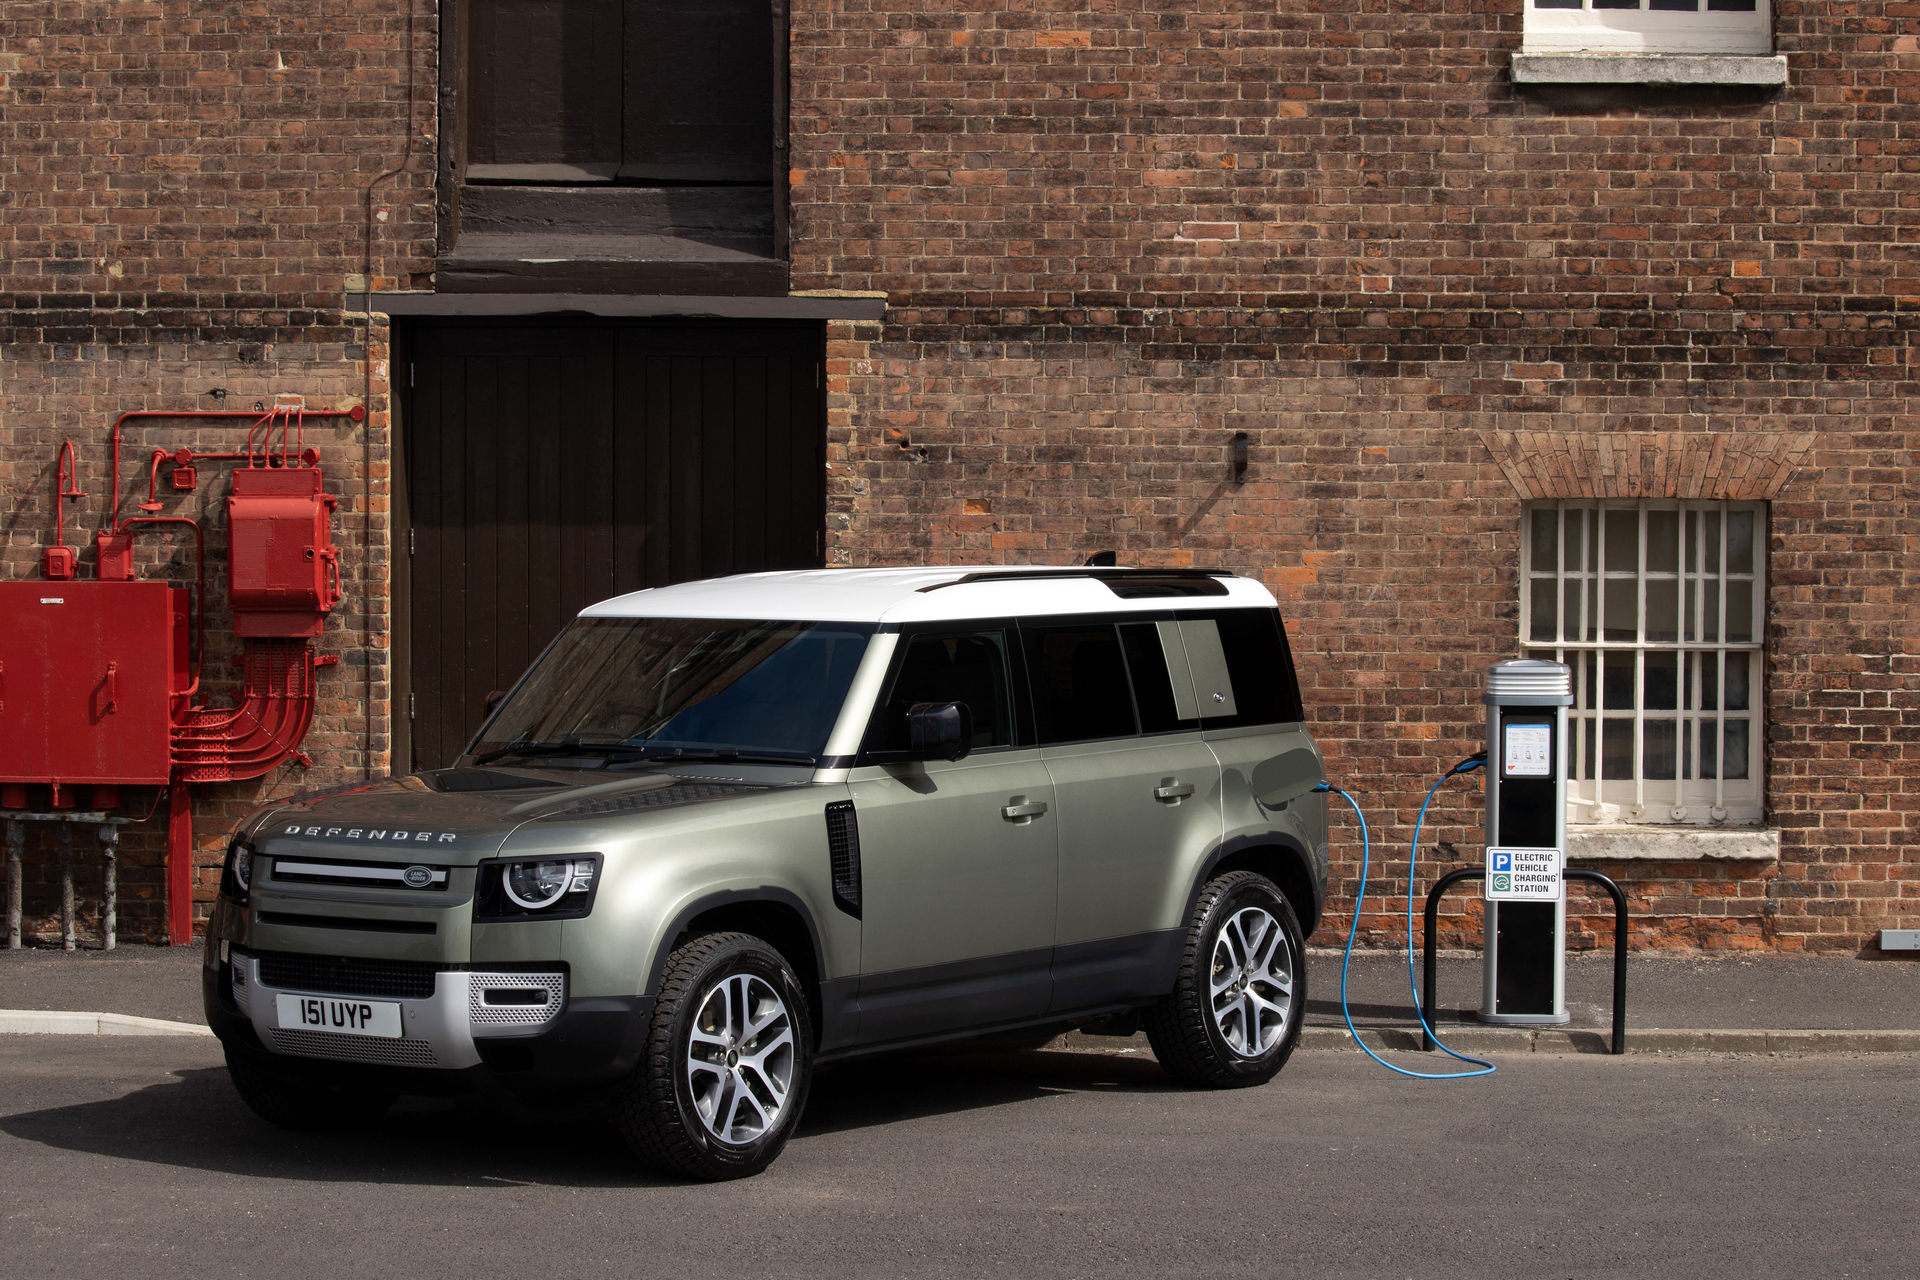 Land Rover Defender Hibrido Enchufable